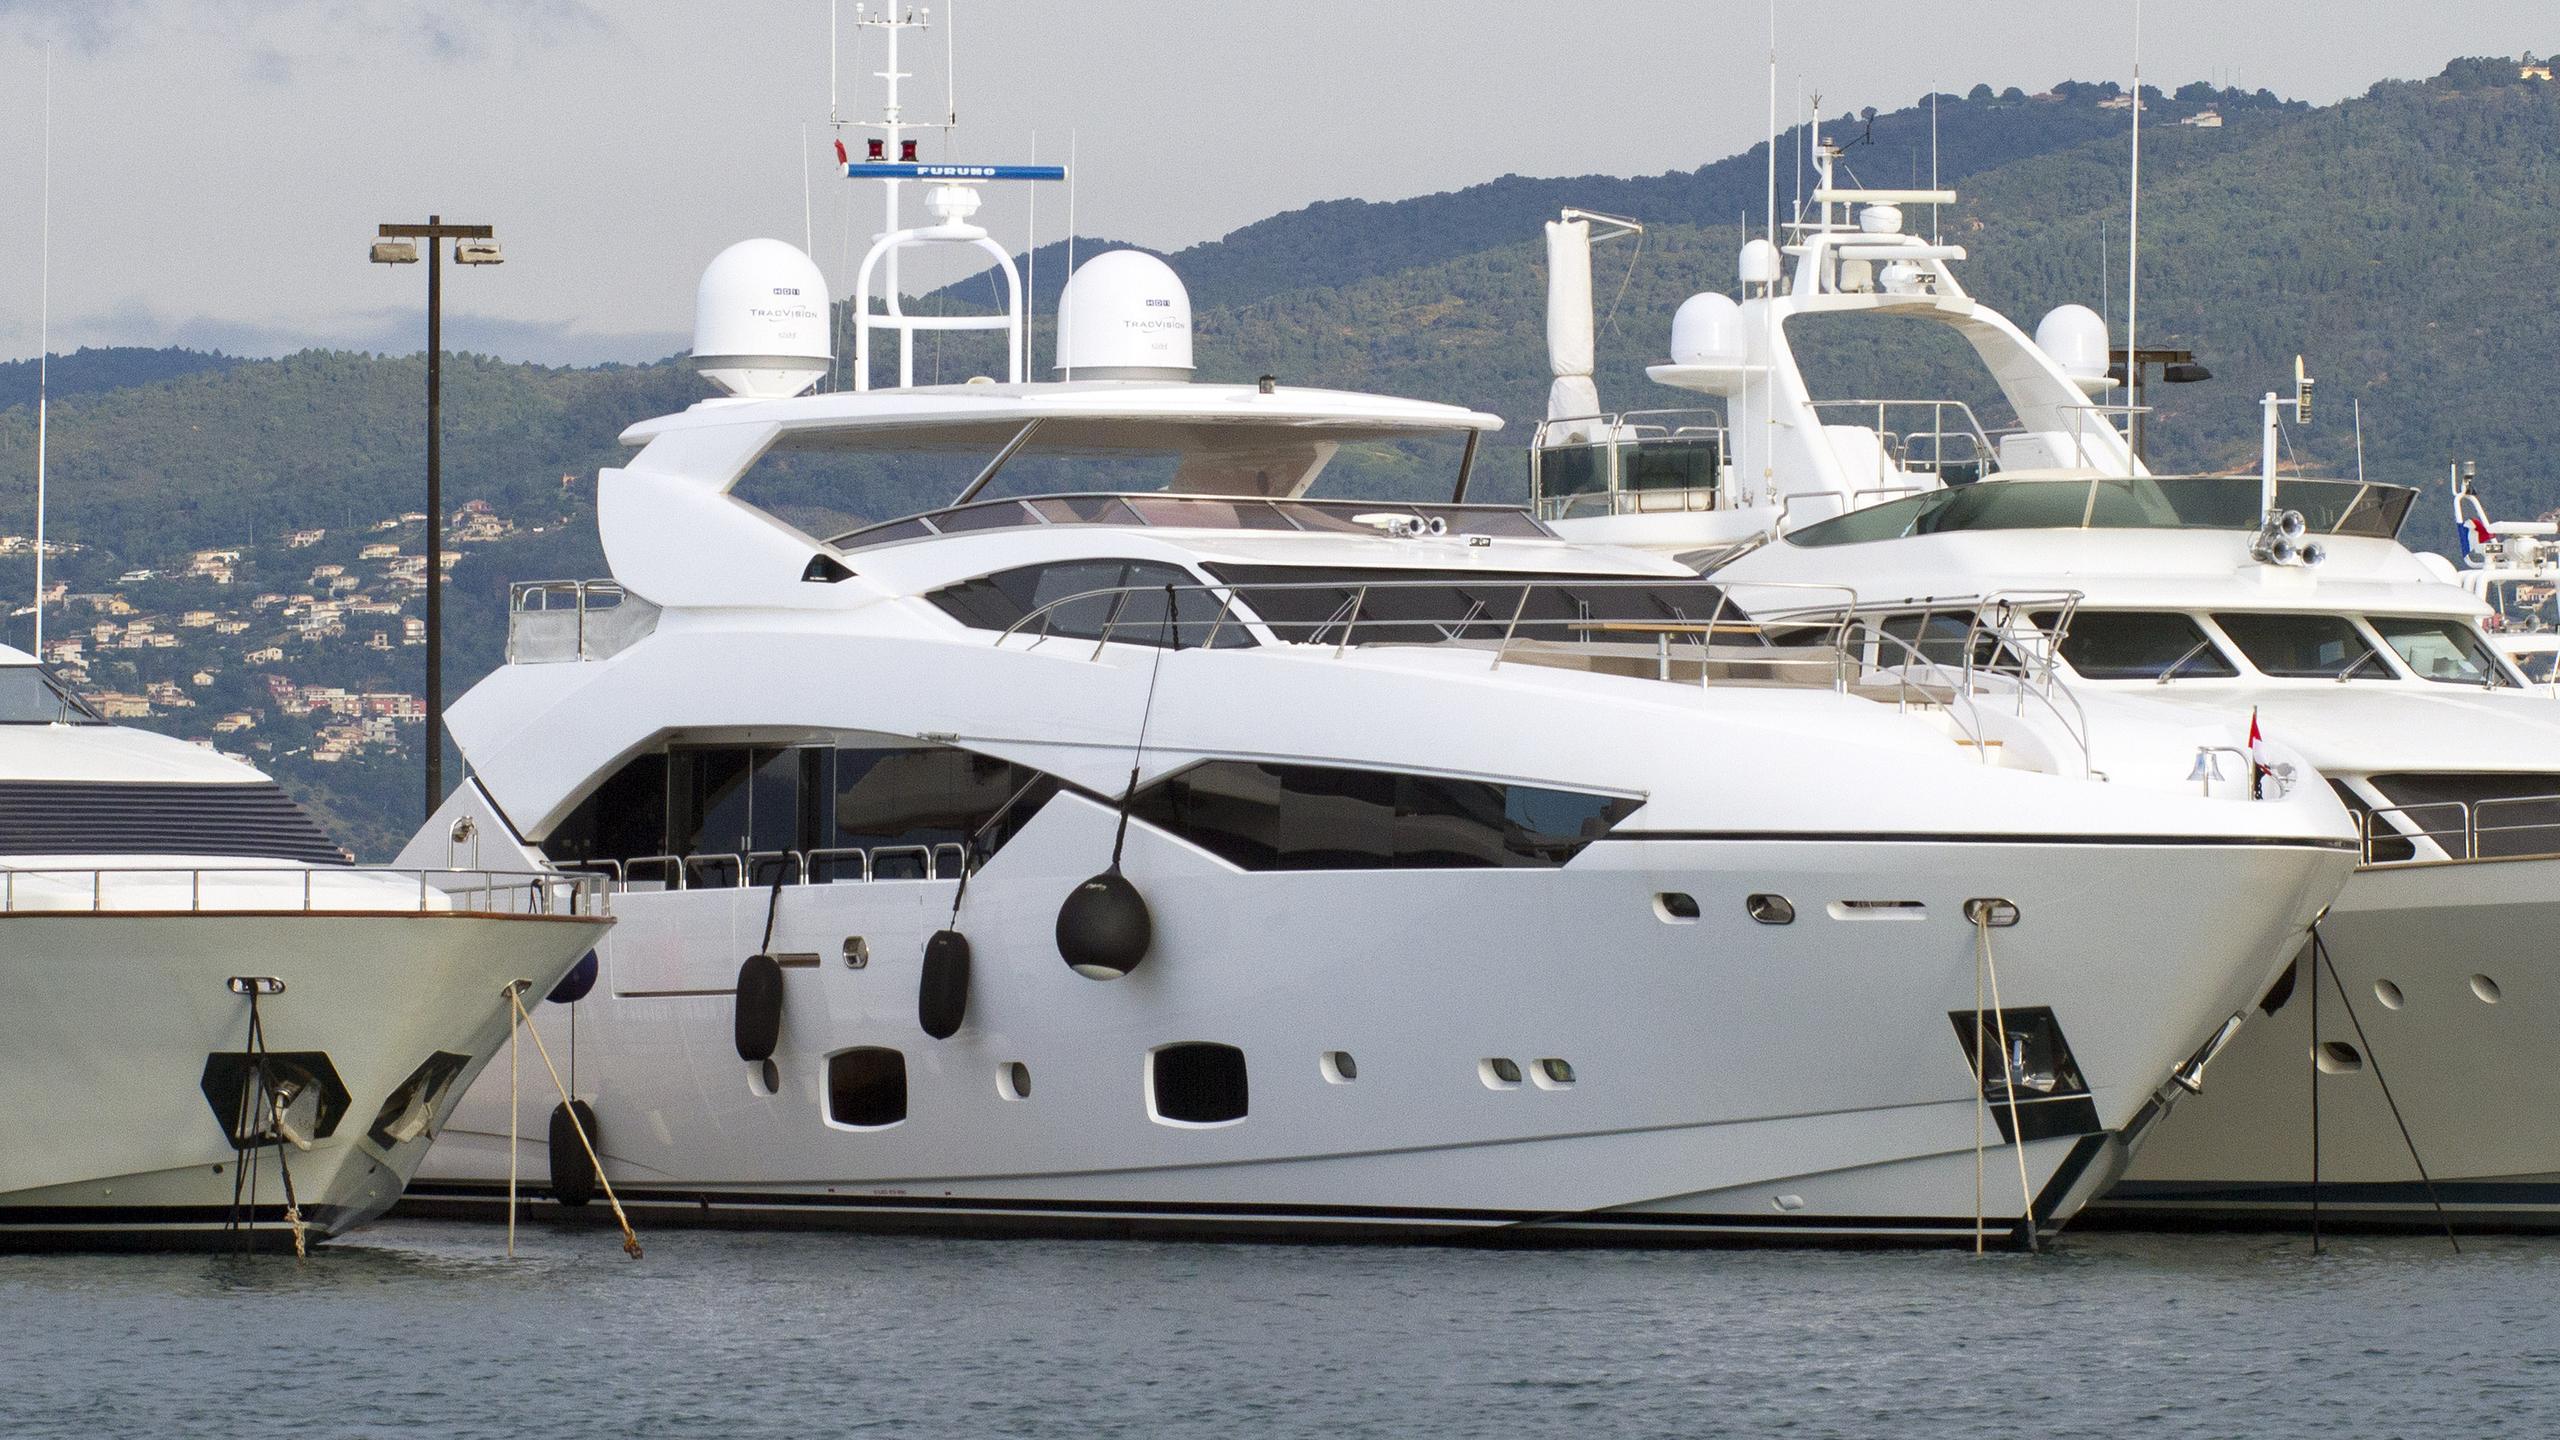 maoro-motor-yacht-sunseeker-115sy-2013-35m-half-profile